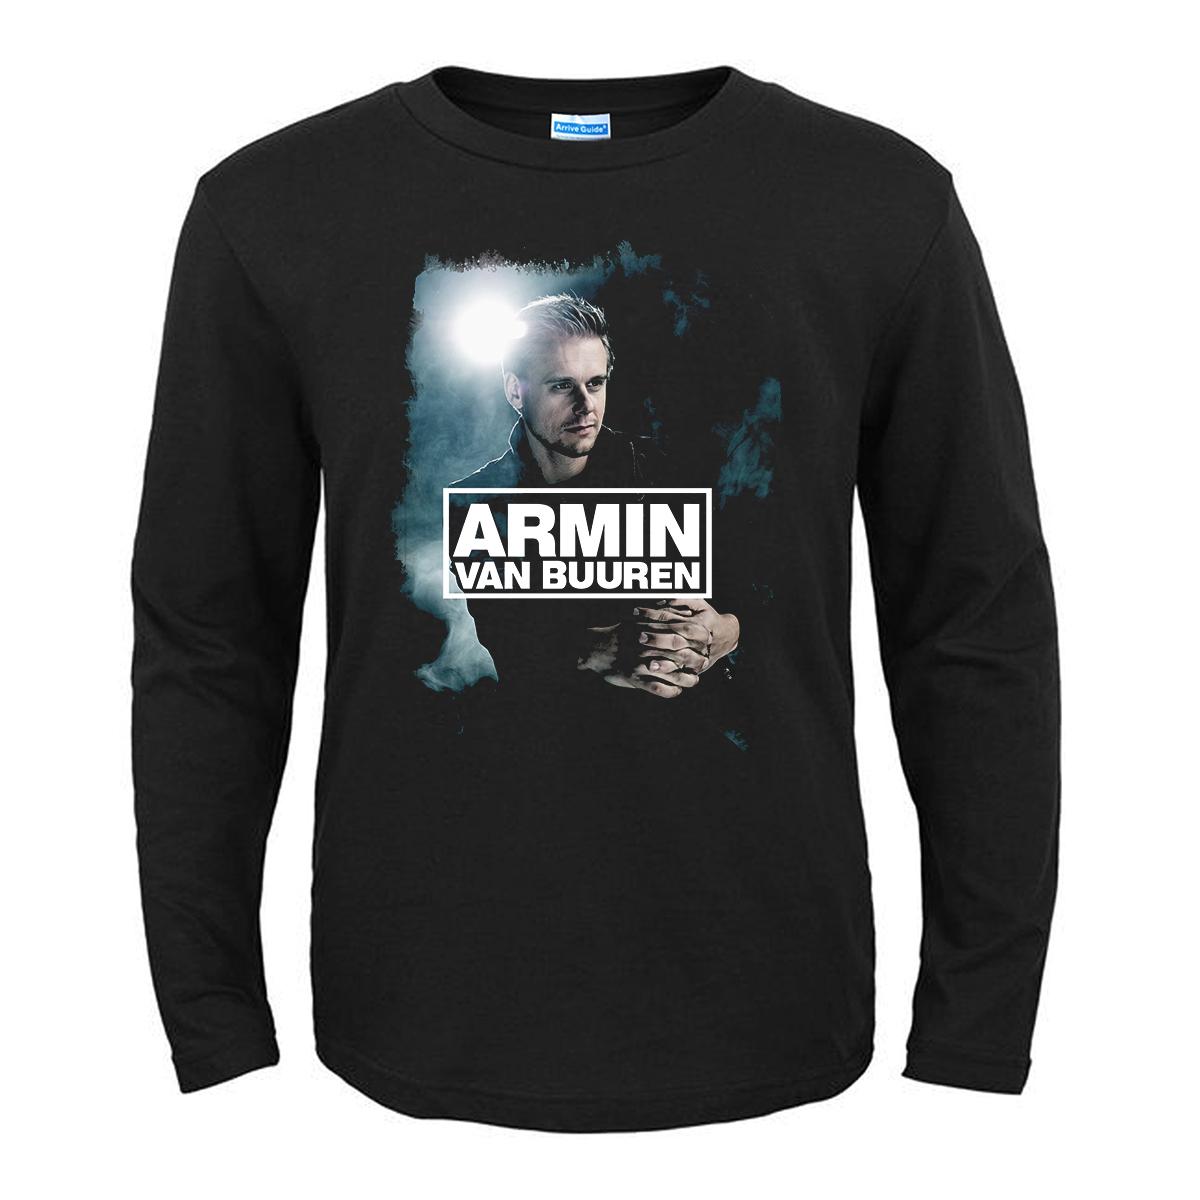 Merch T-Shirt Armin Van Buuren Club Life Black